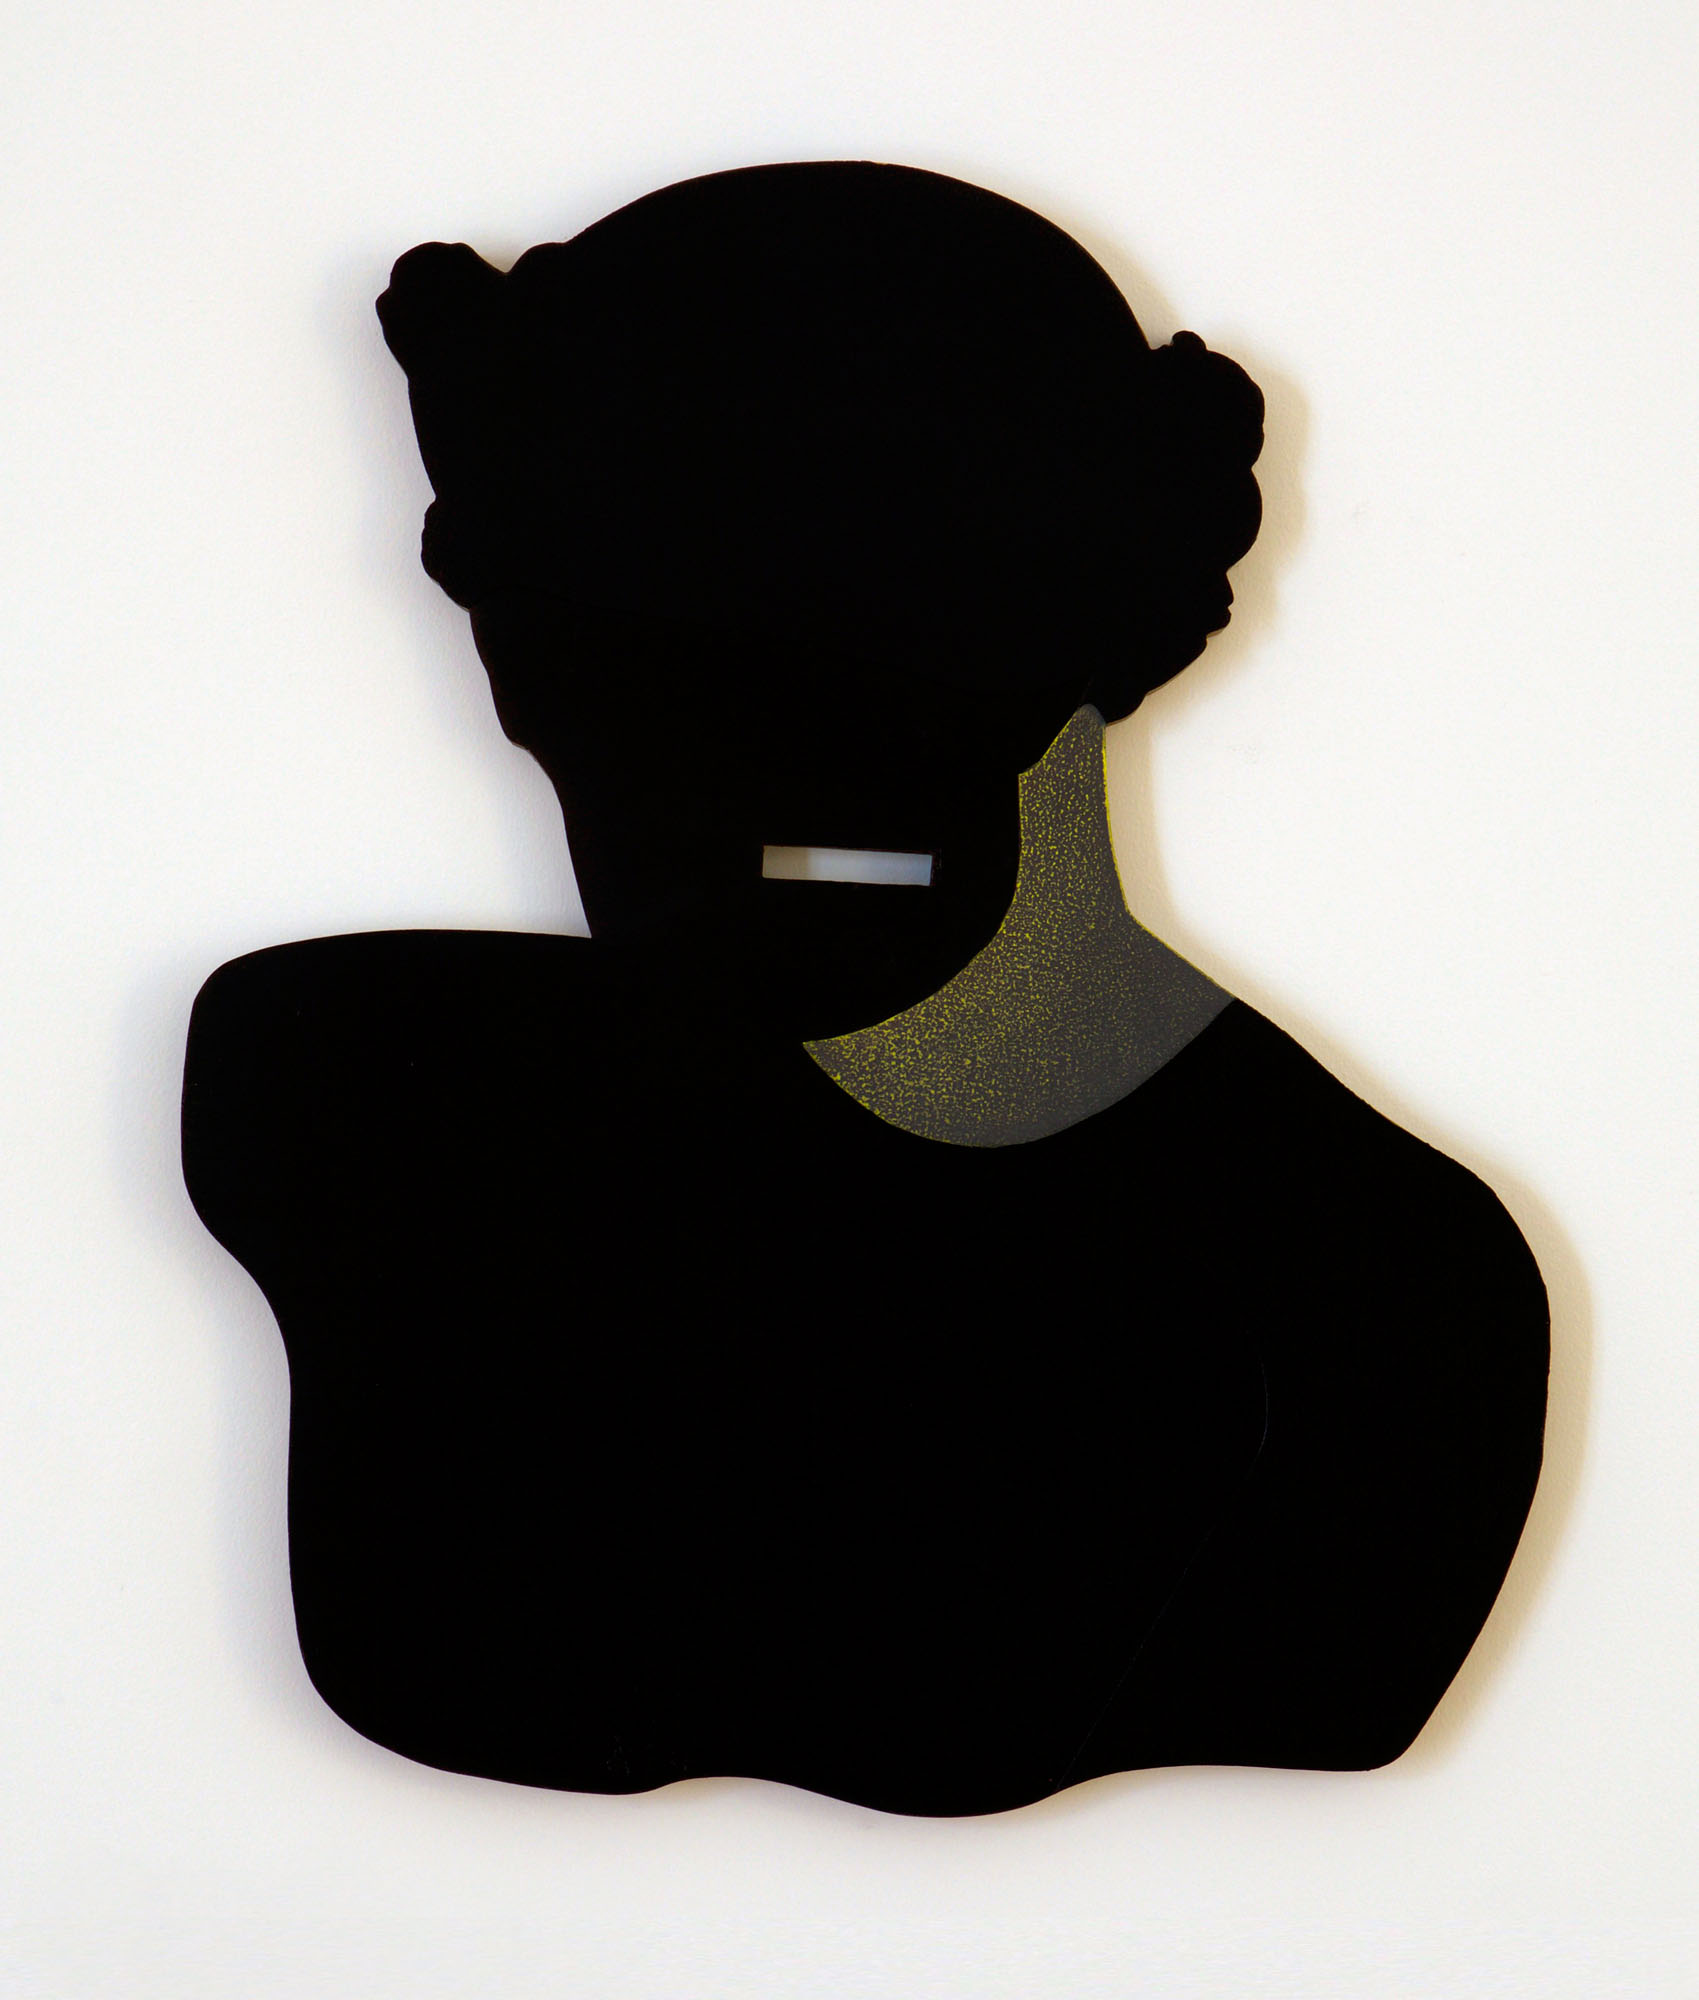 Vivian Greven  -,  2018 Oil on MDF 21.26 x 15.35 inches (53 x 44.5 cm)